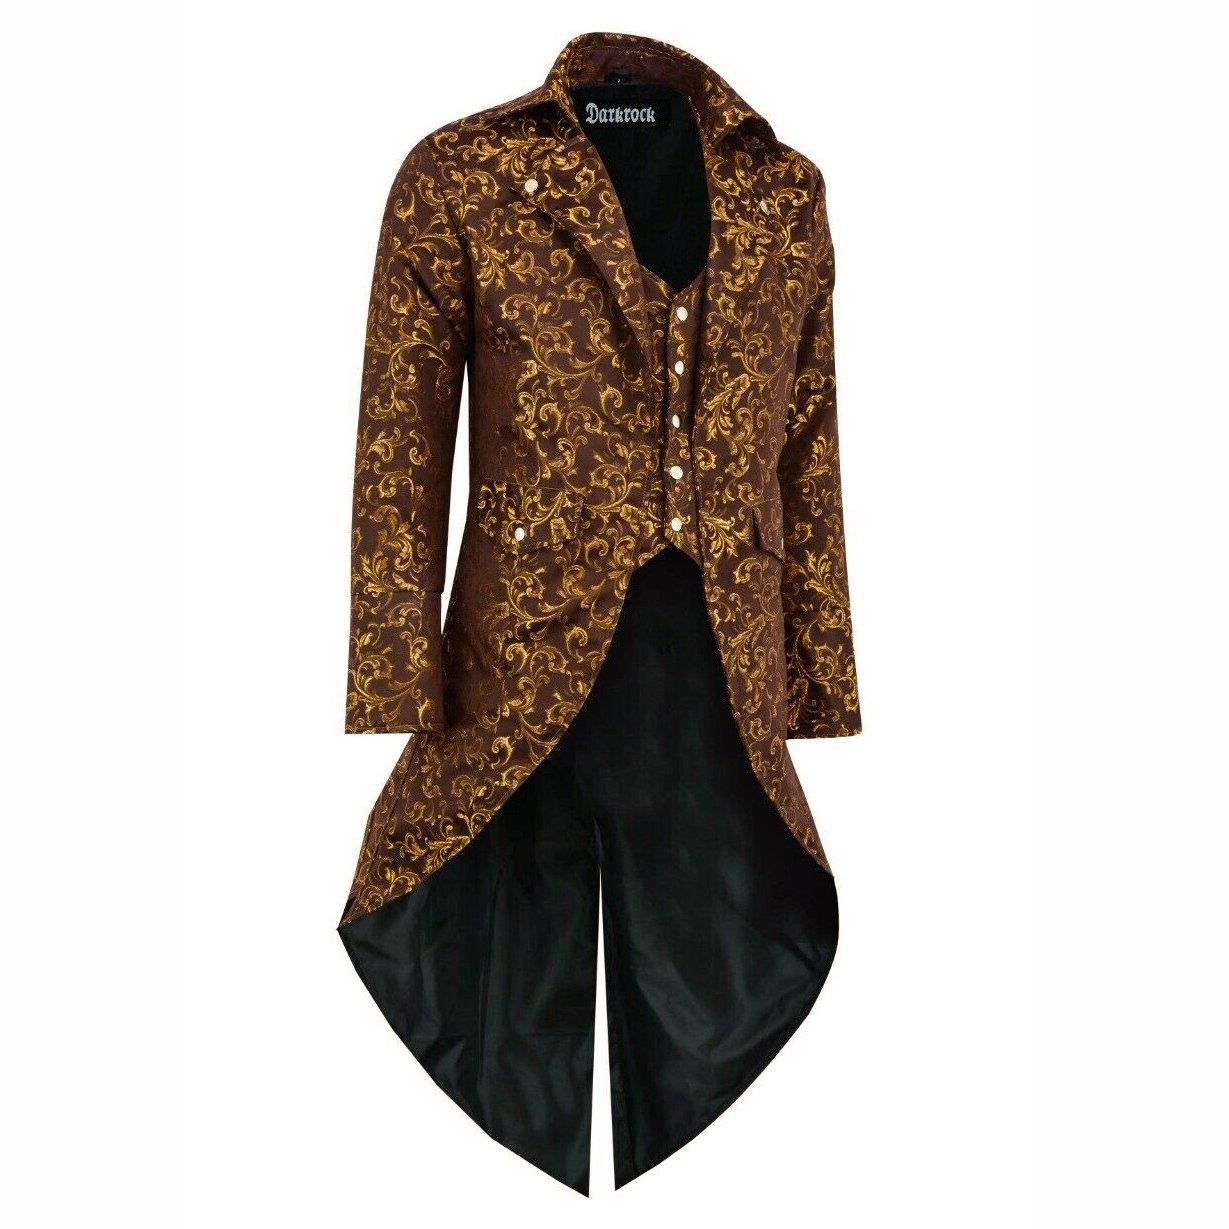 DARKROCK Handmade Men Tail coat Jacket Gold Brocade Goth (1)